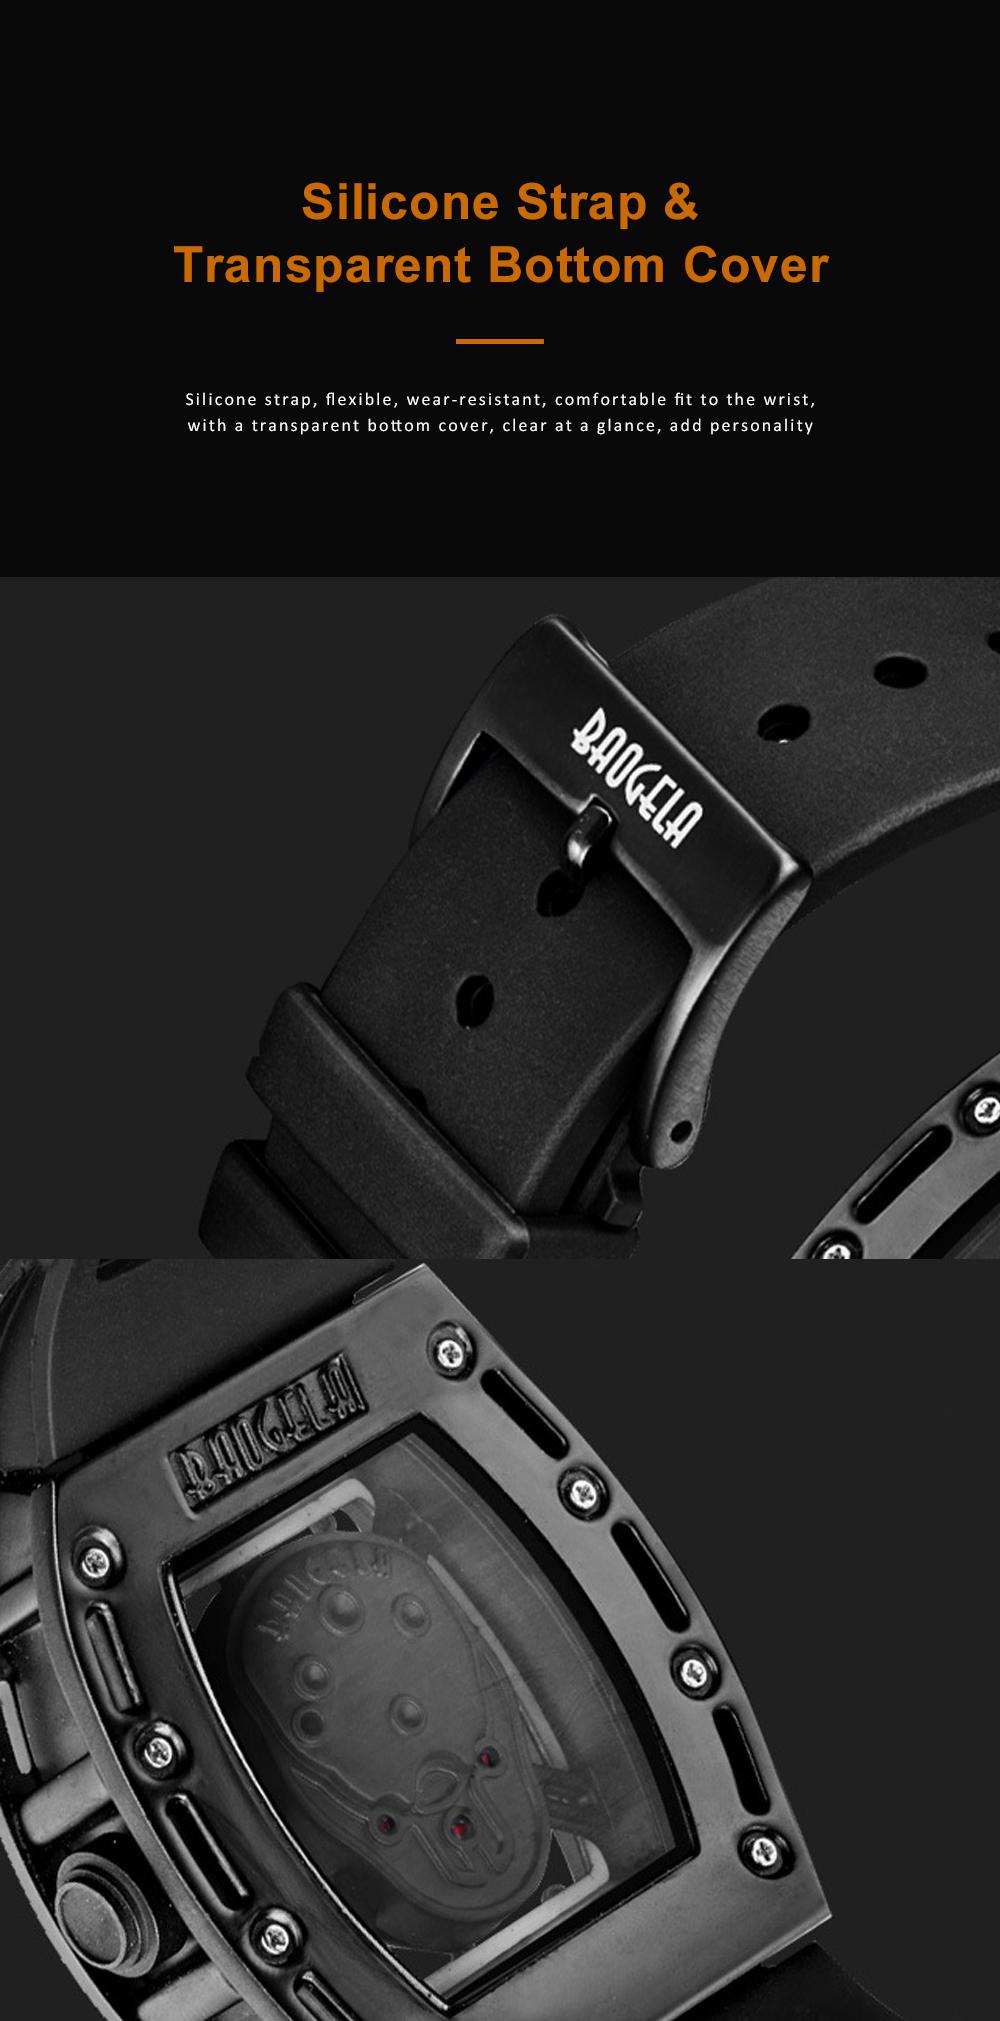 2020 Hot Sell Watches Men Luxury Brand Automatic Silicone Shantou Hollow Men's Quartz Watch Waterproof Movement 4